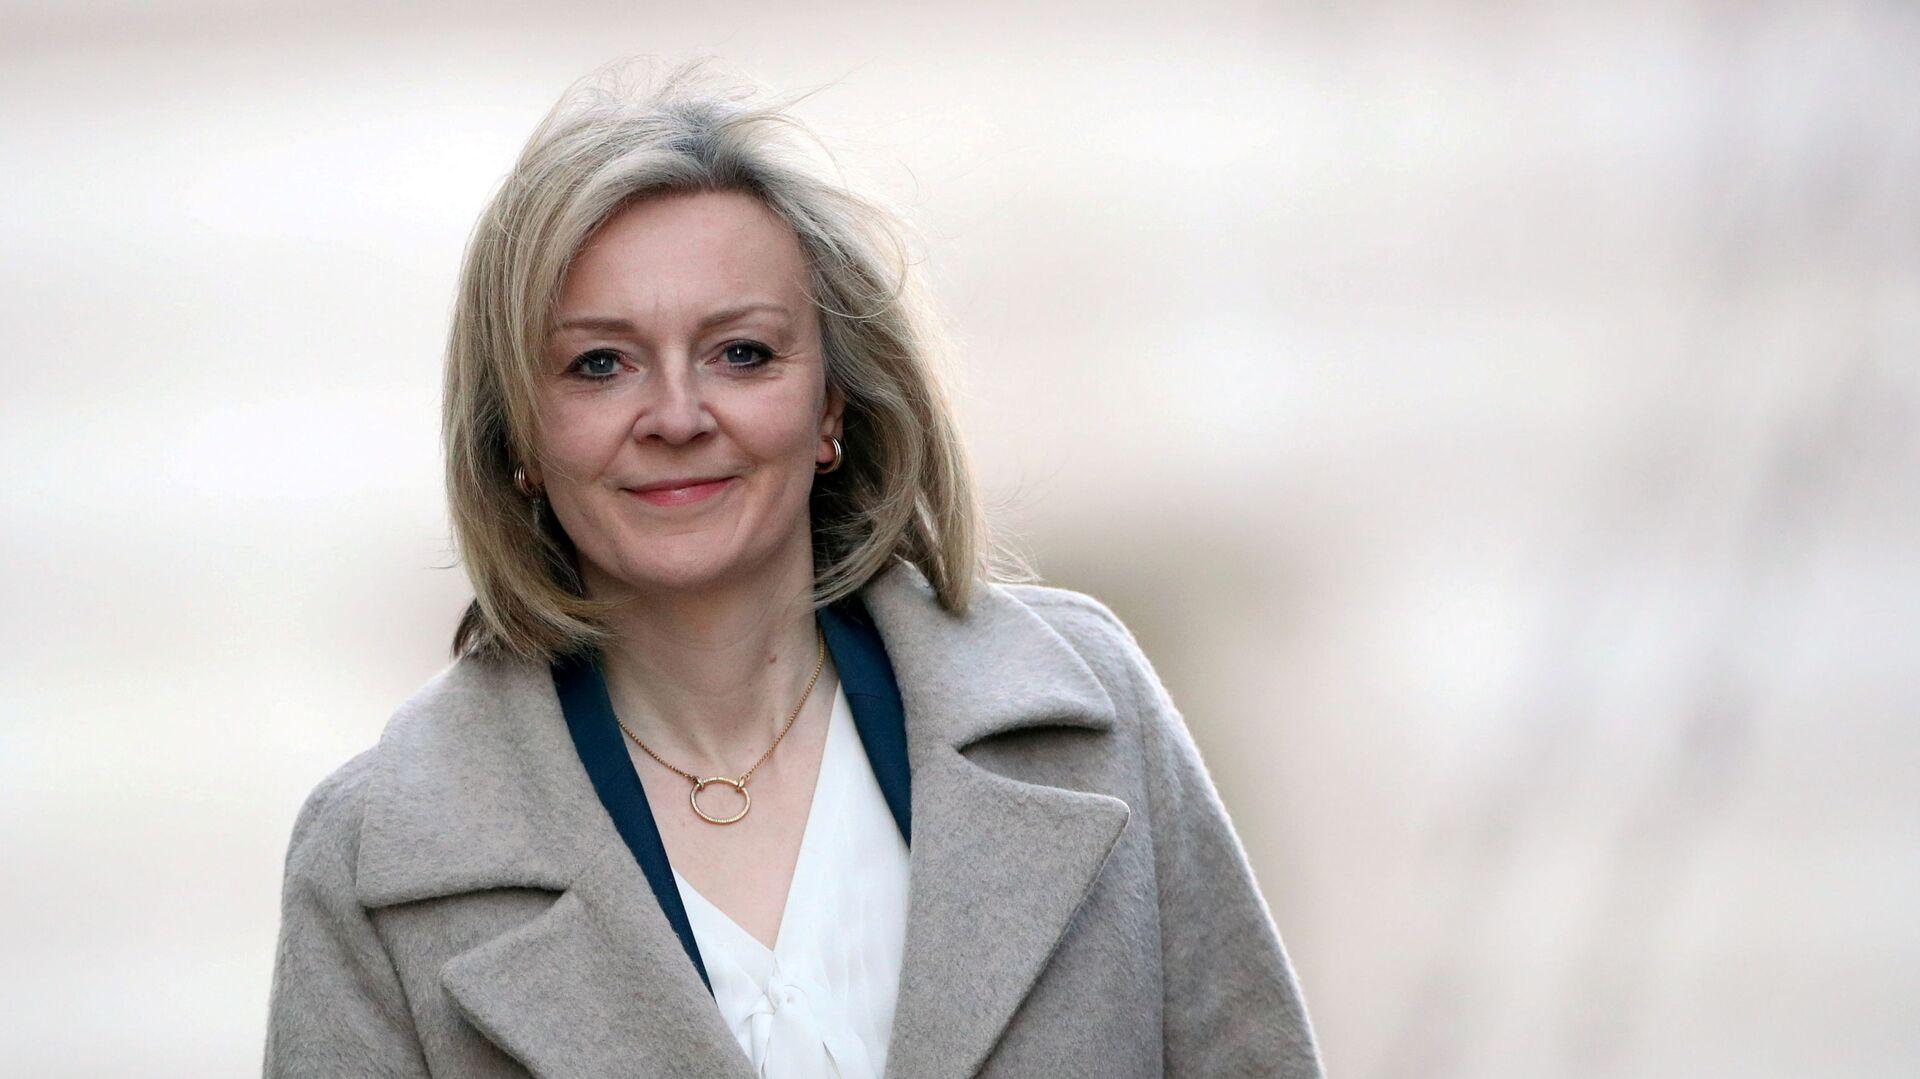 Britain's International Trade Secretary Liz Truss arrives at Downing Street in London, Britain February 11, 2020 - Sputnik International, 1920, 16.09.2021